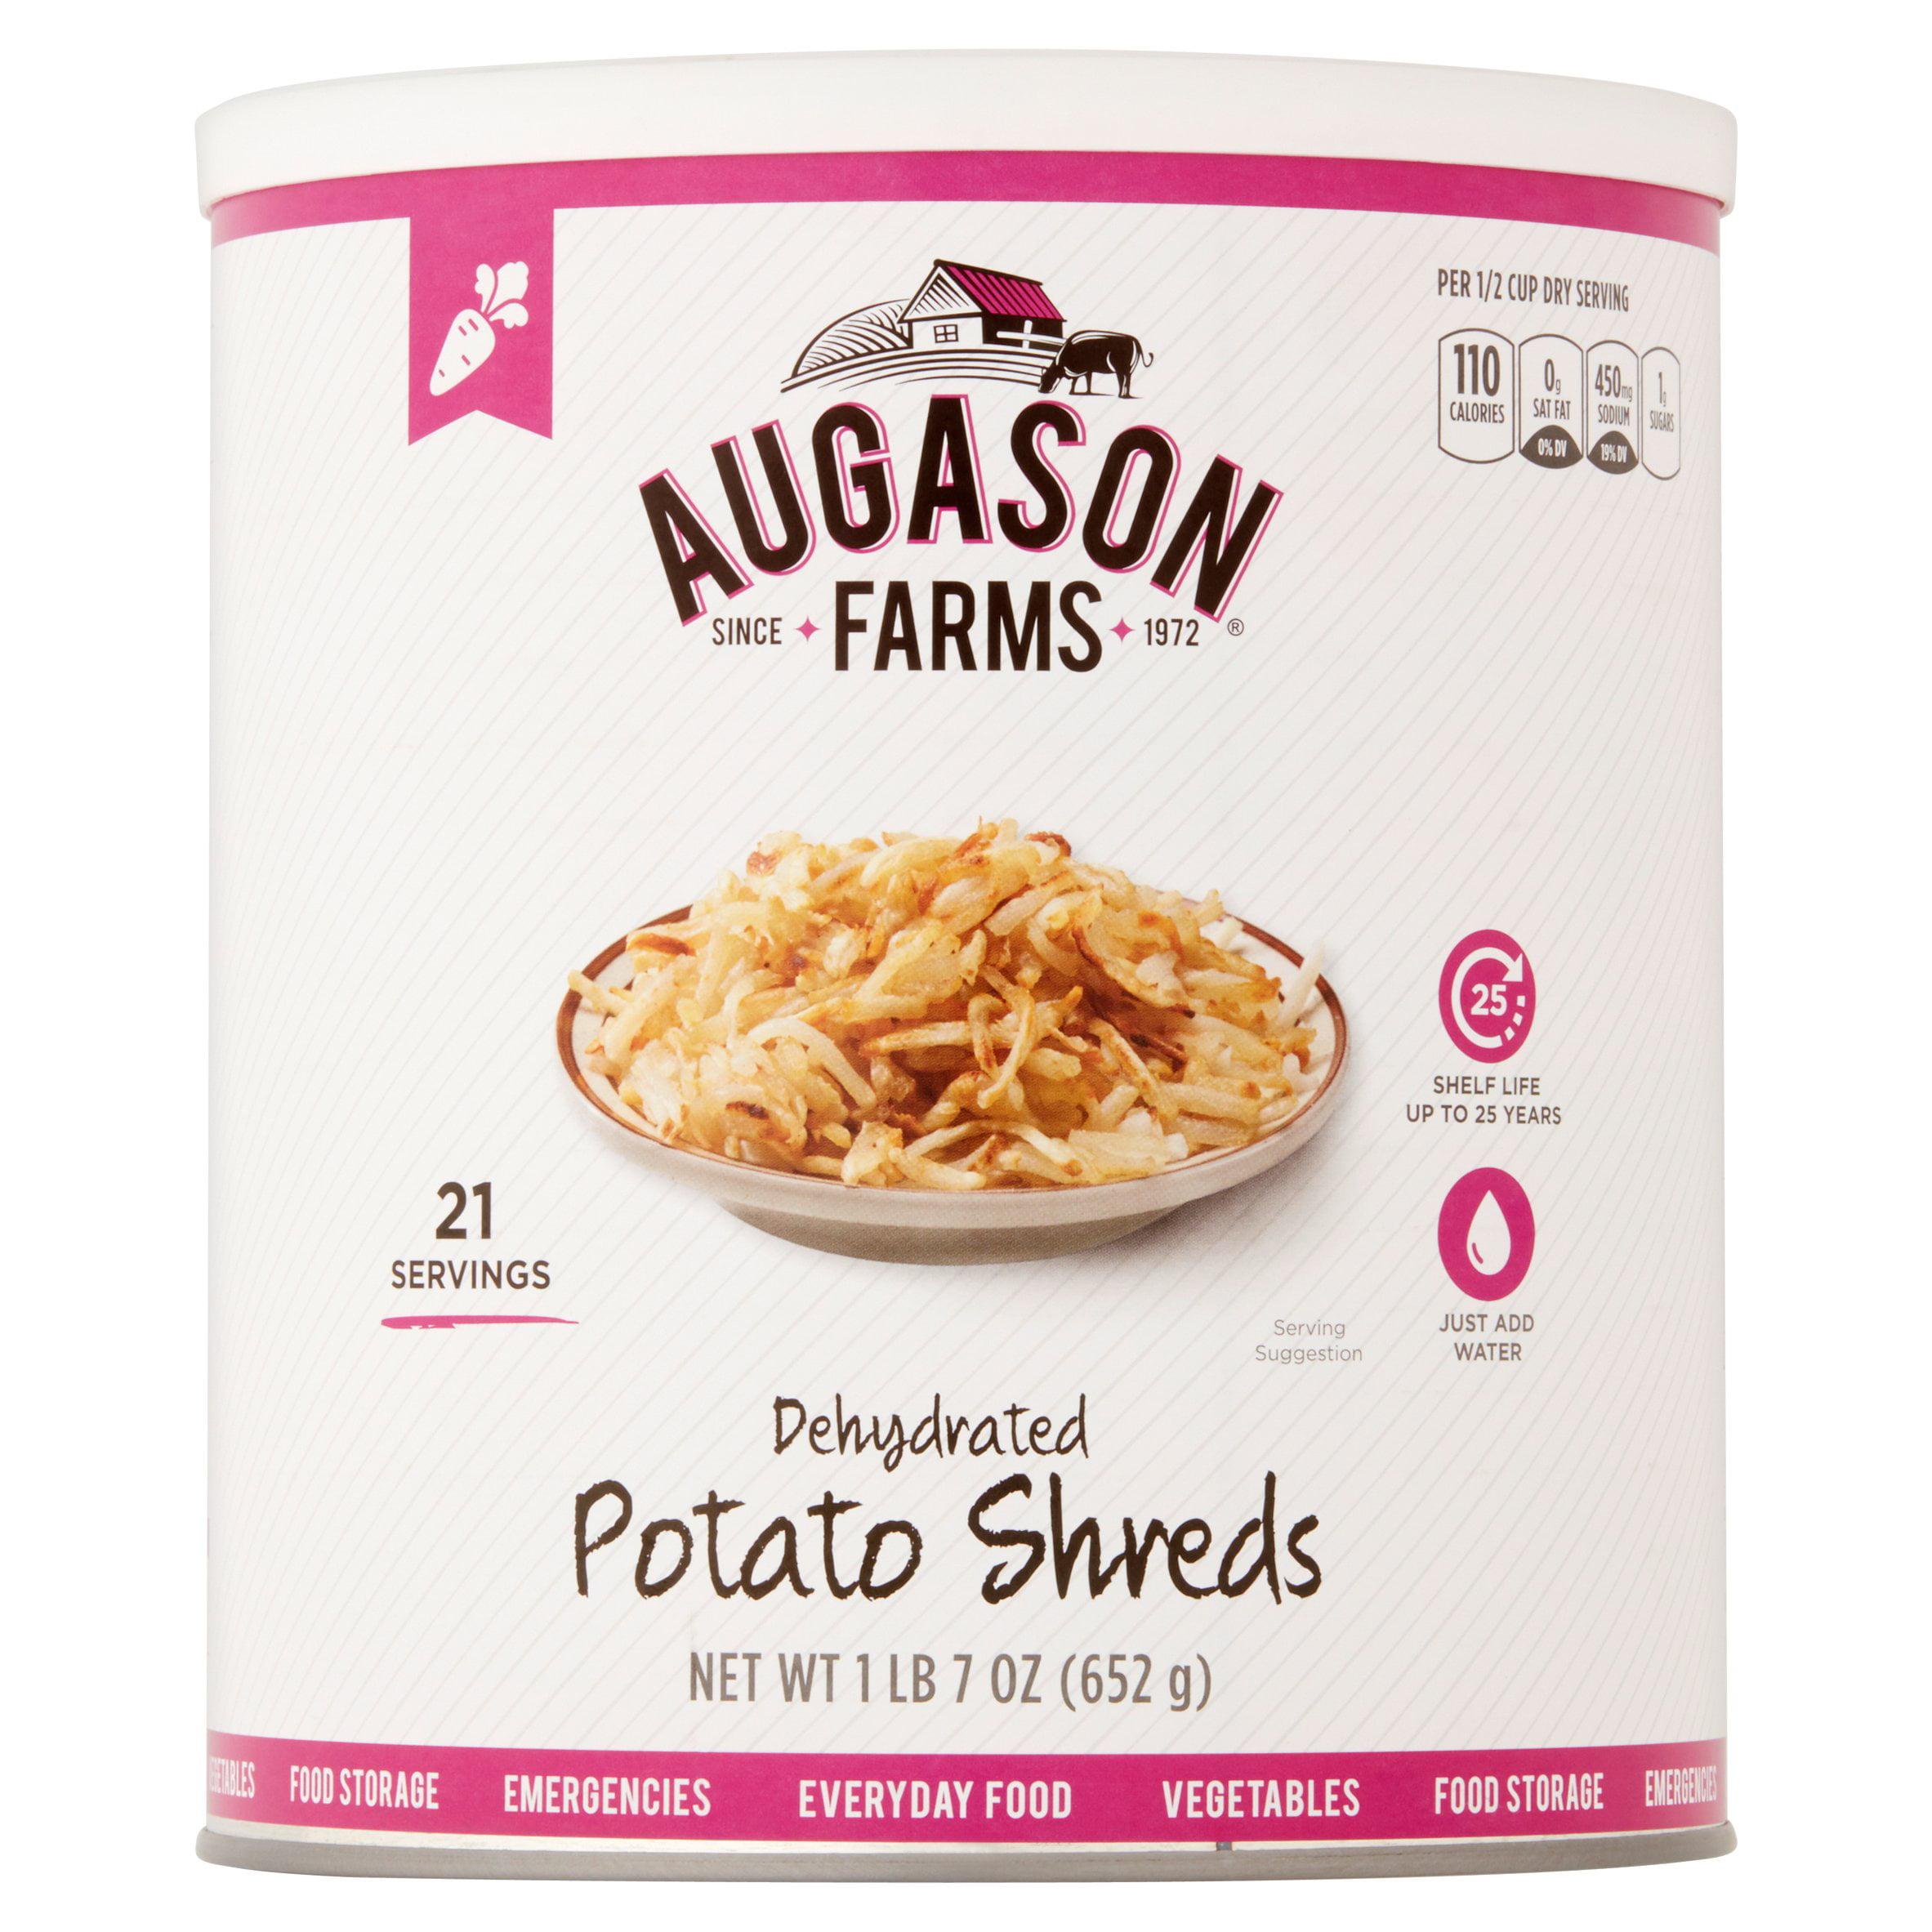 Augason Farms Emergency Food Dehydrated Potato Shreds, 23 oz by Blue Chip Group